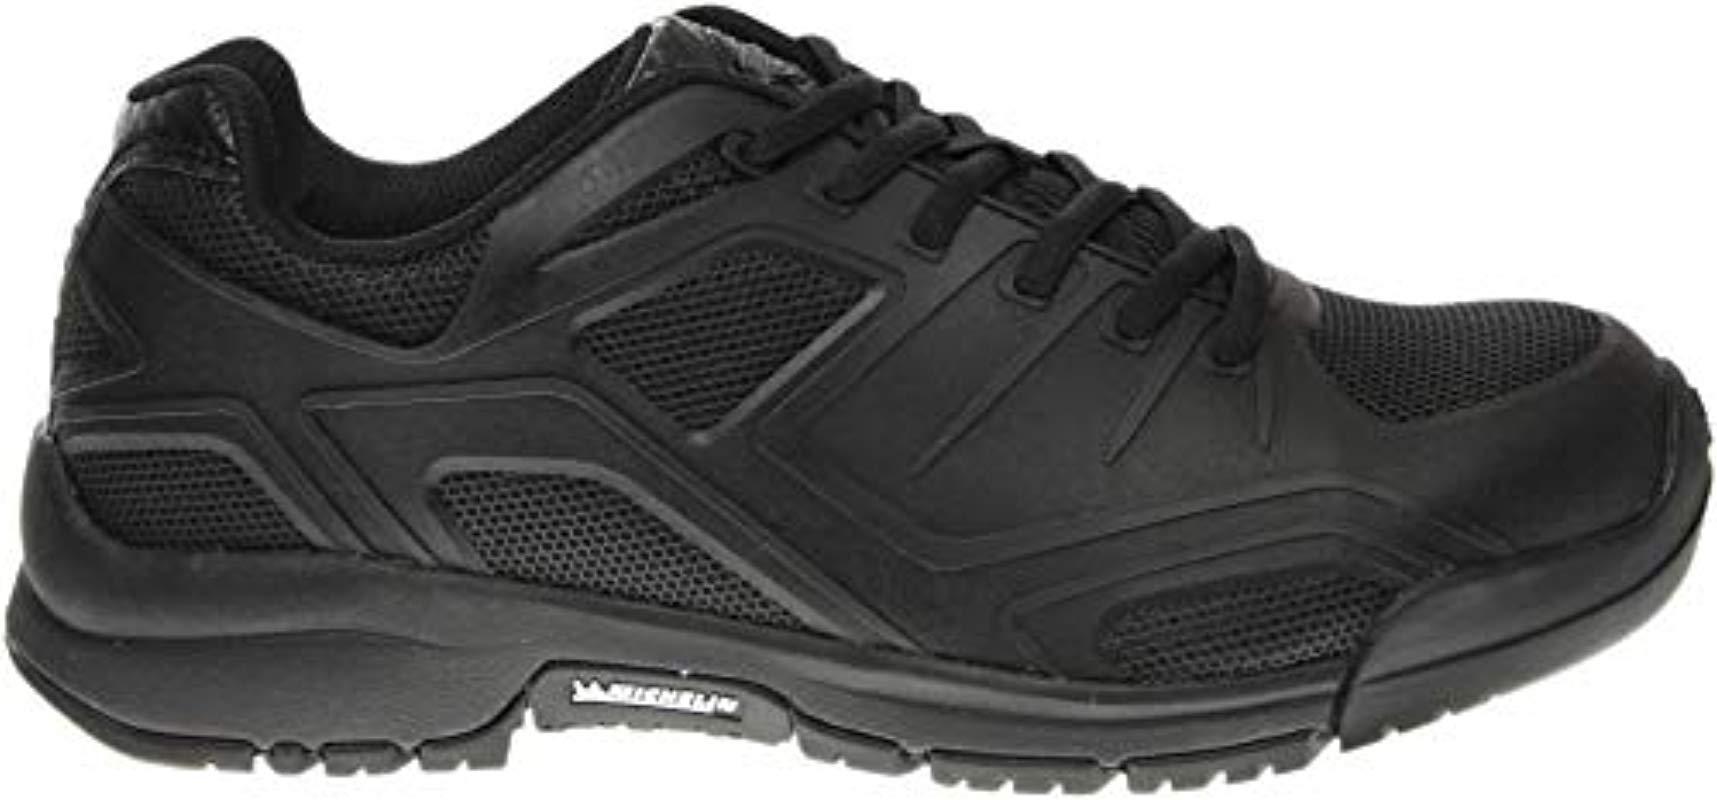 553093cab29 Lyst - Dickies Spectre Black Industrial Boot in Black for Men